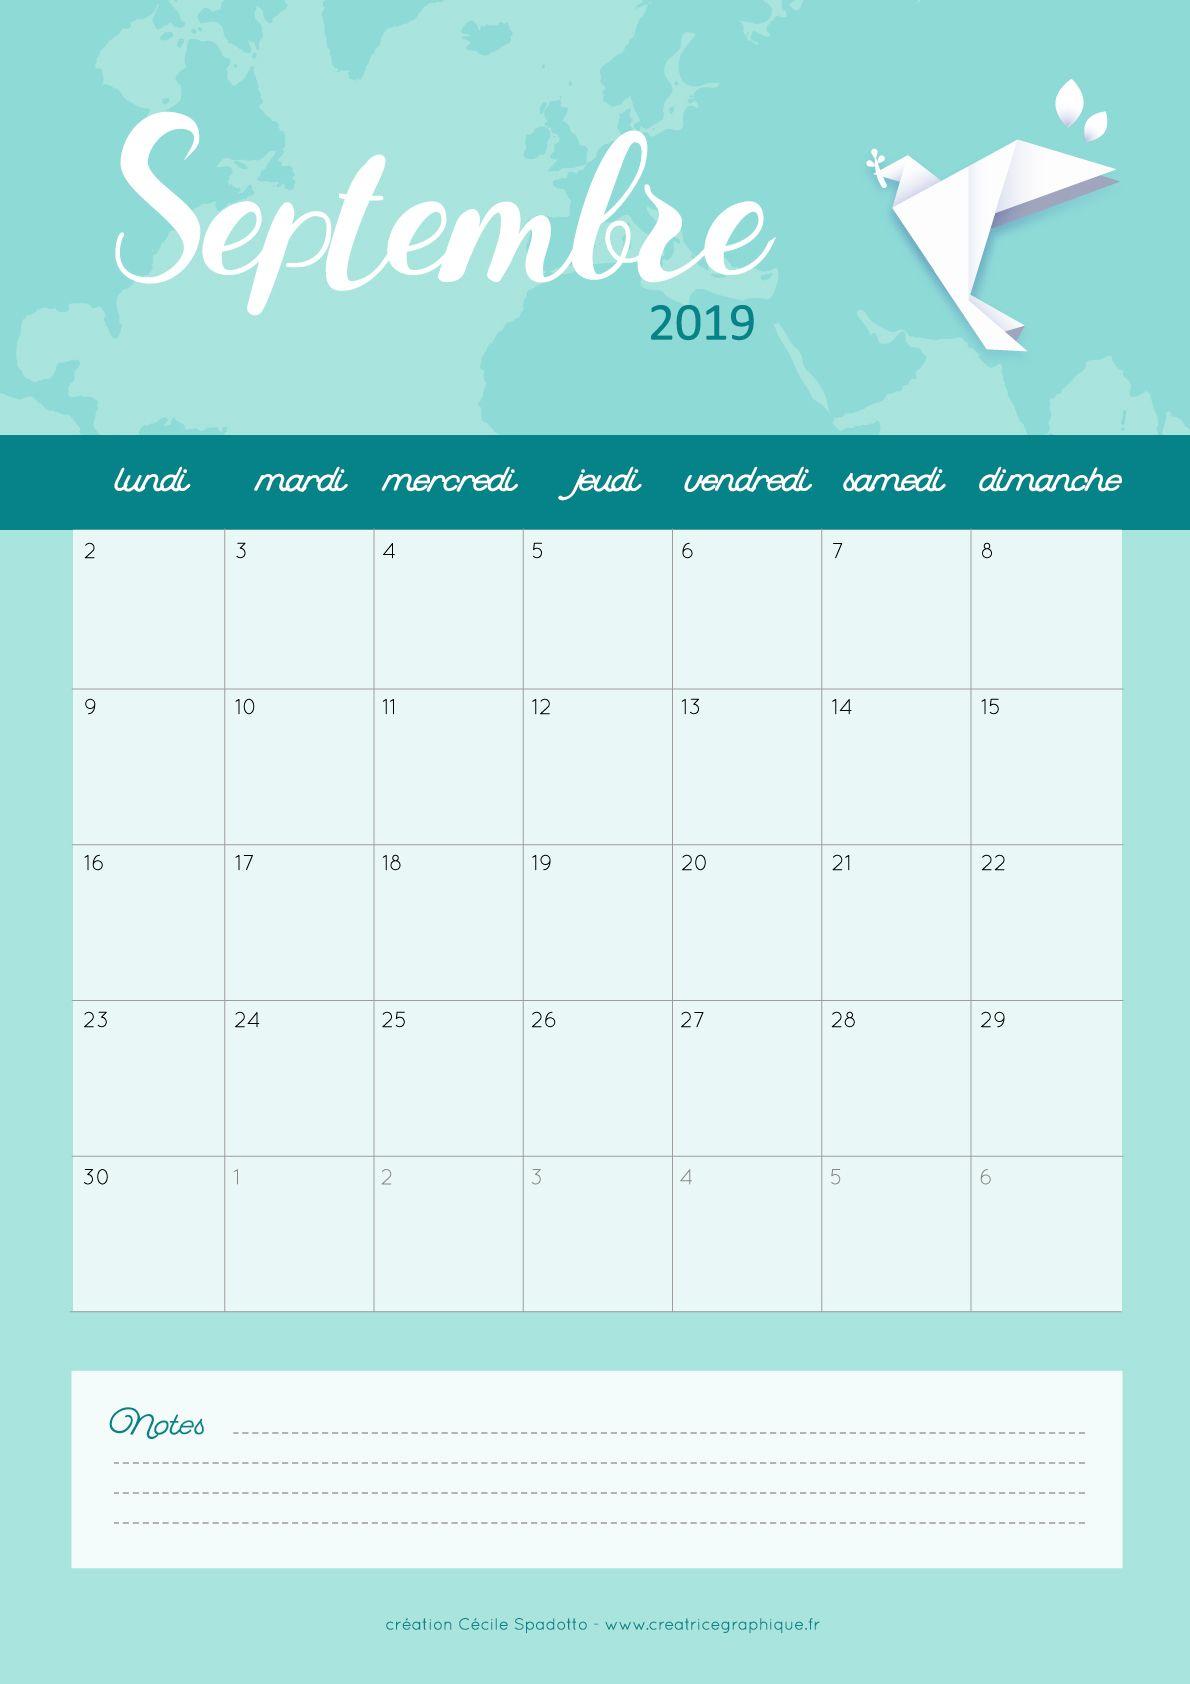 Calendrier Telecharger.Calendrier Septembre 2019 Mes Creations De Calendriers